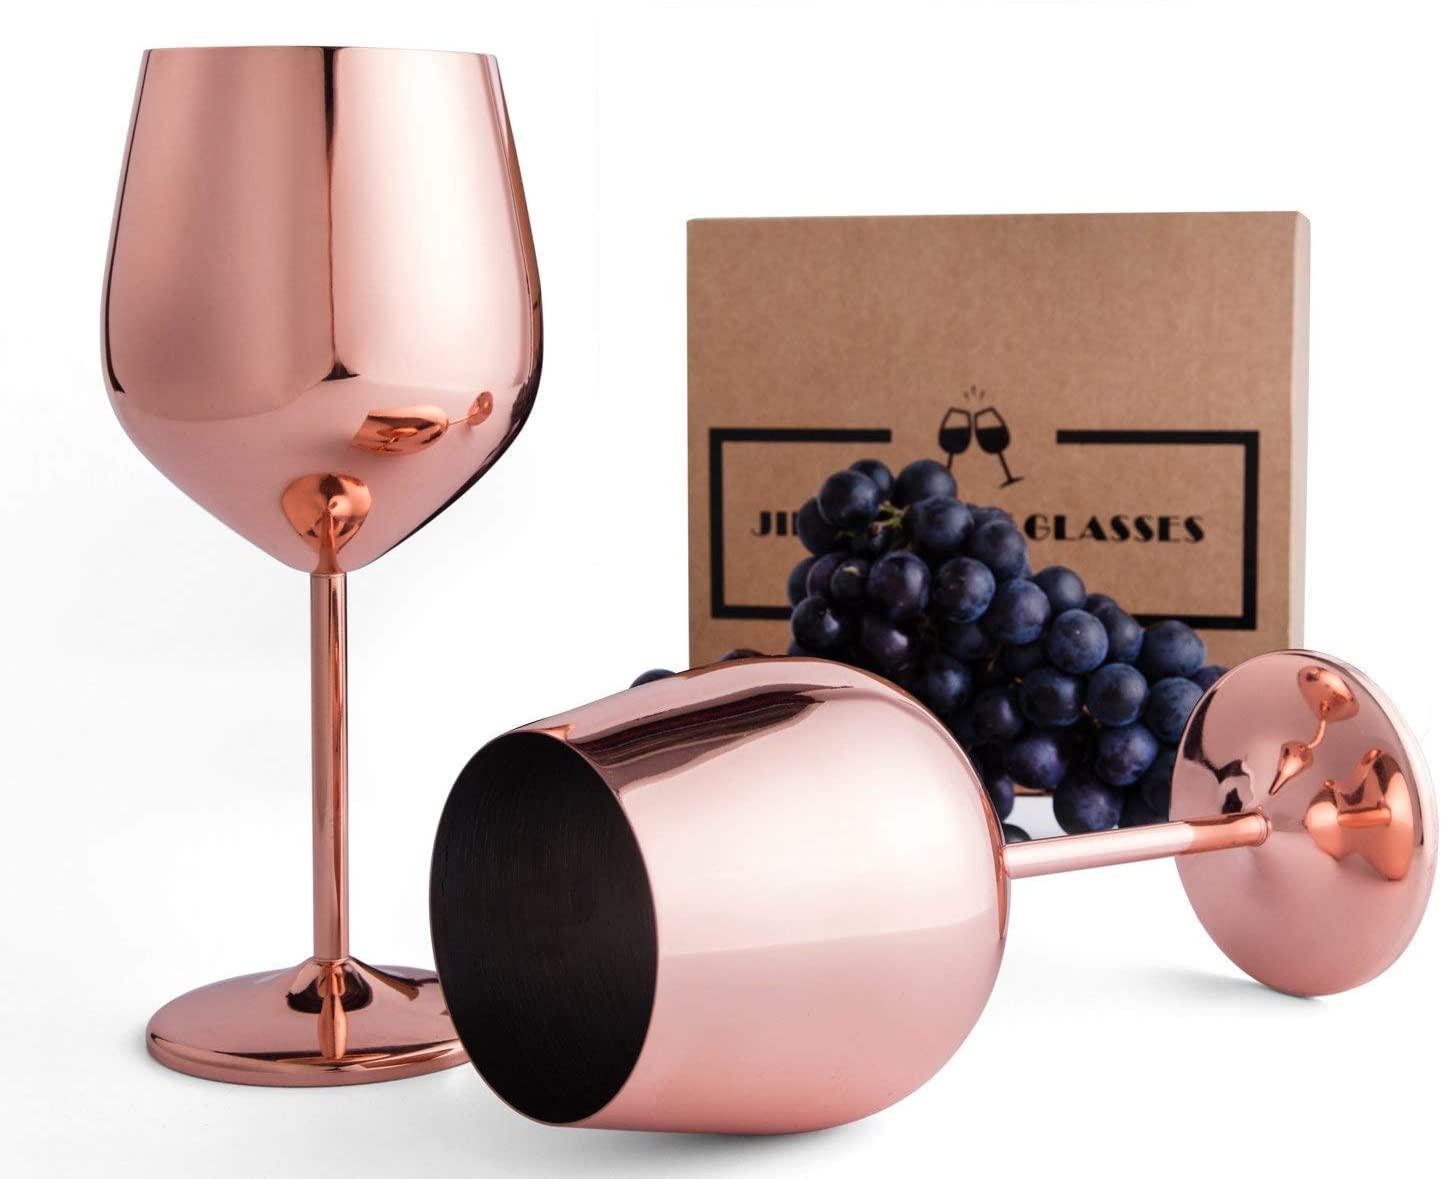 2 Unbreakable Wine Glasses